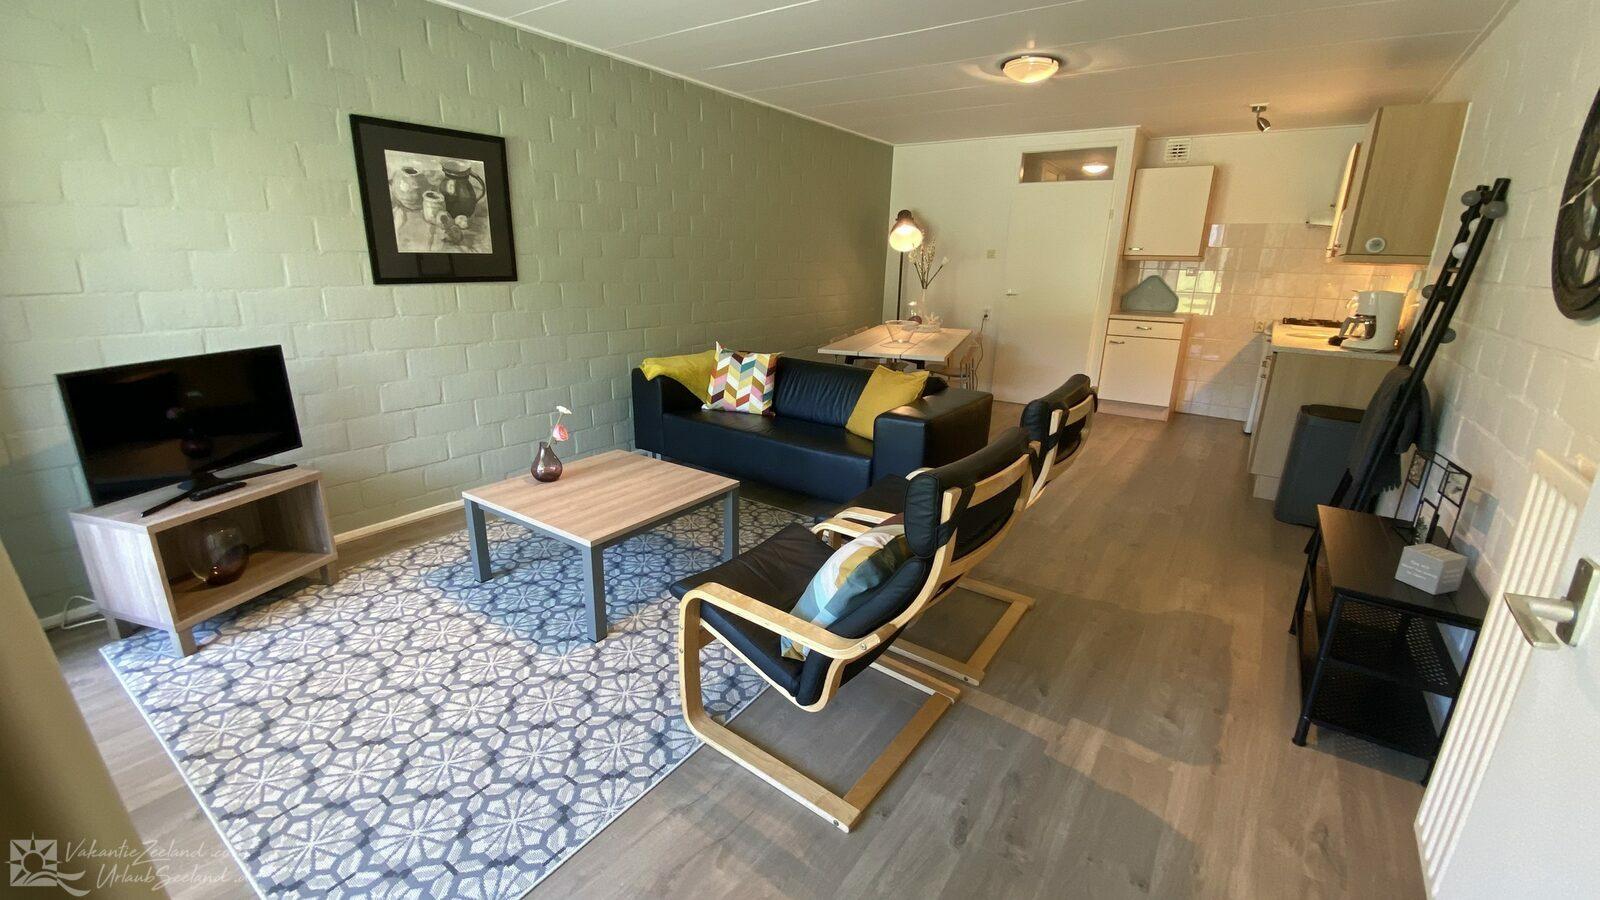 VZ1010  Apartment in Zoutelande